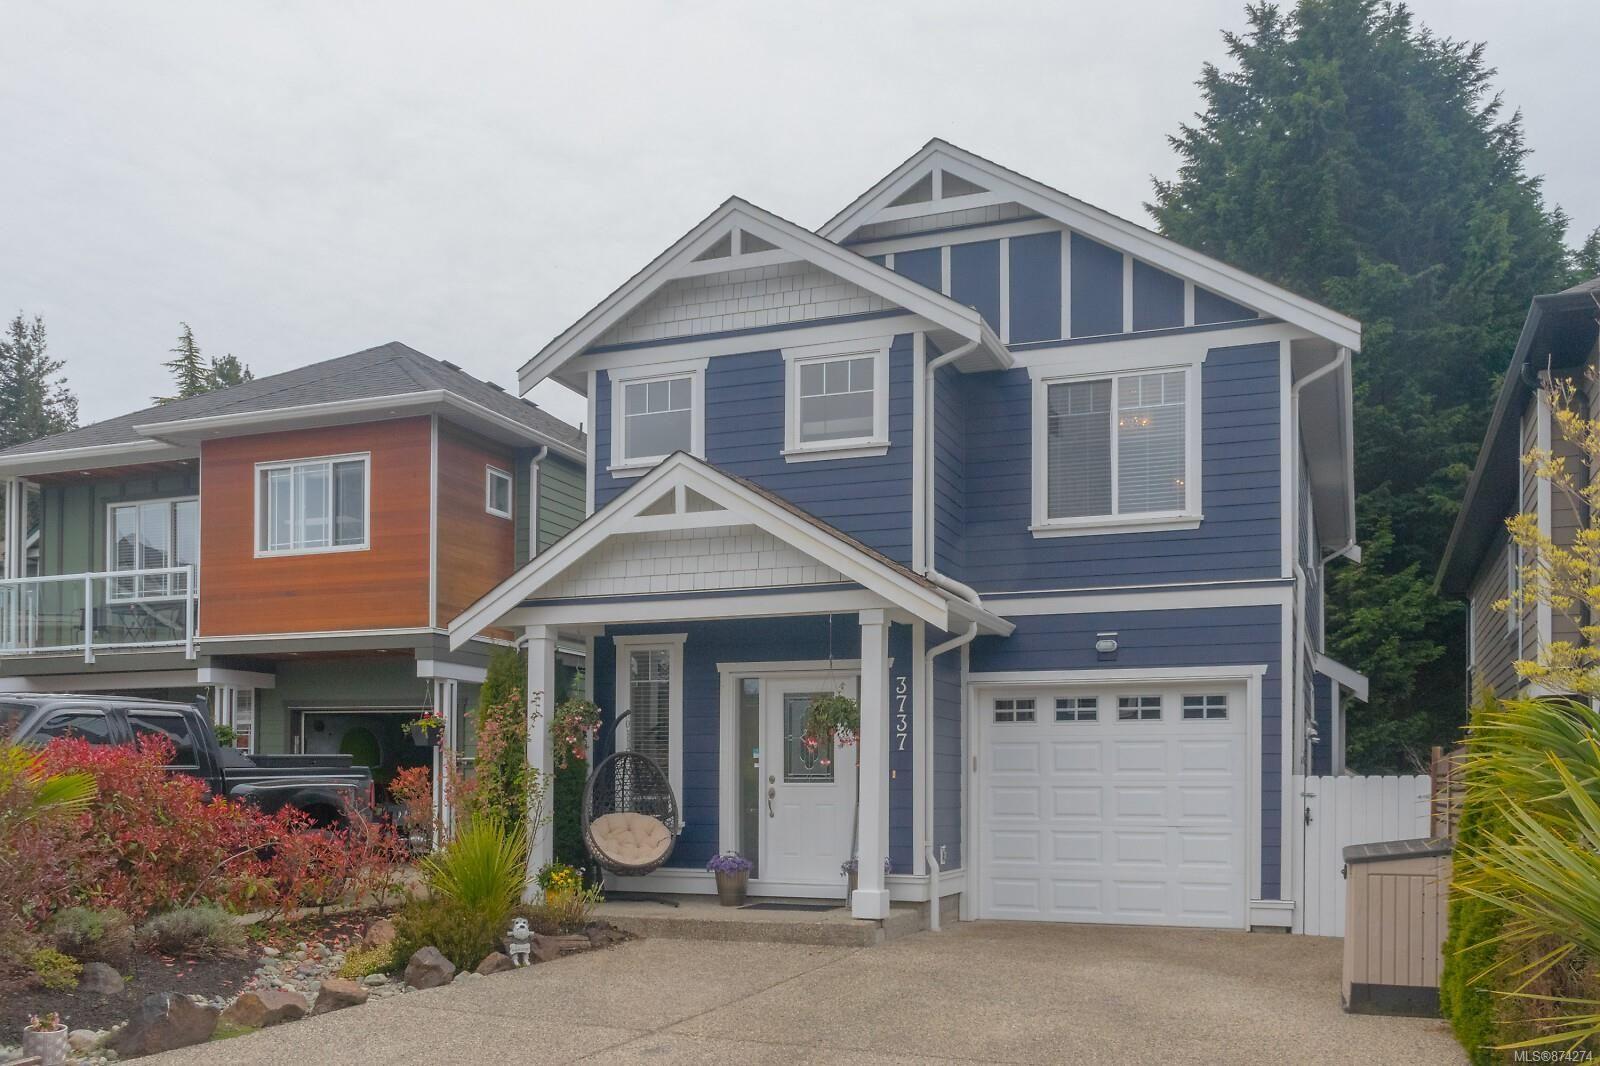 Main Photo: 3737 Cornus Crt in Langford: La Happy Valley House for sale : MLS®# 874274